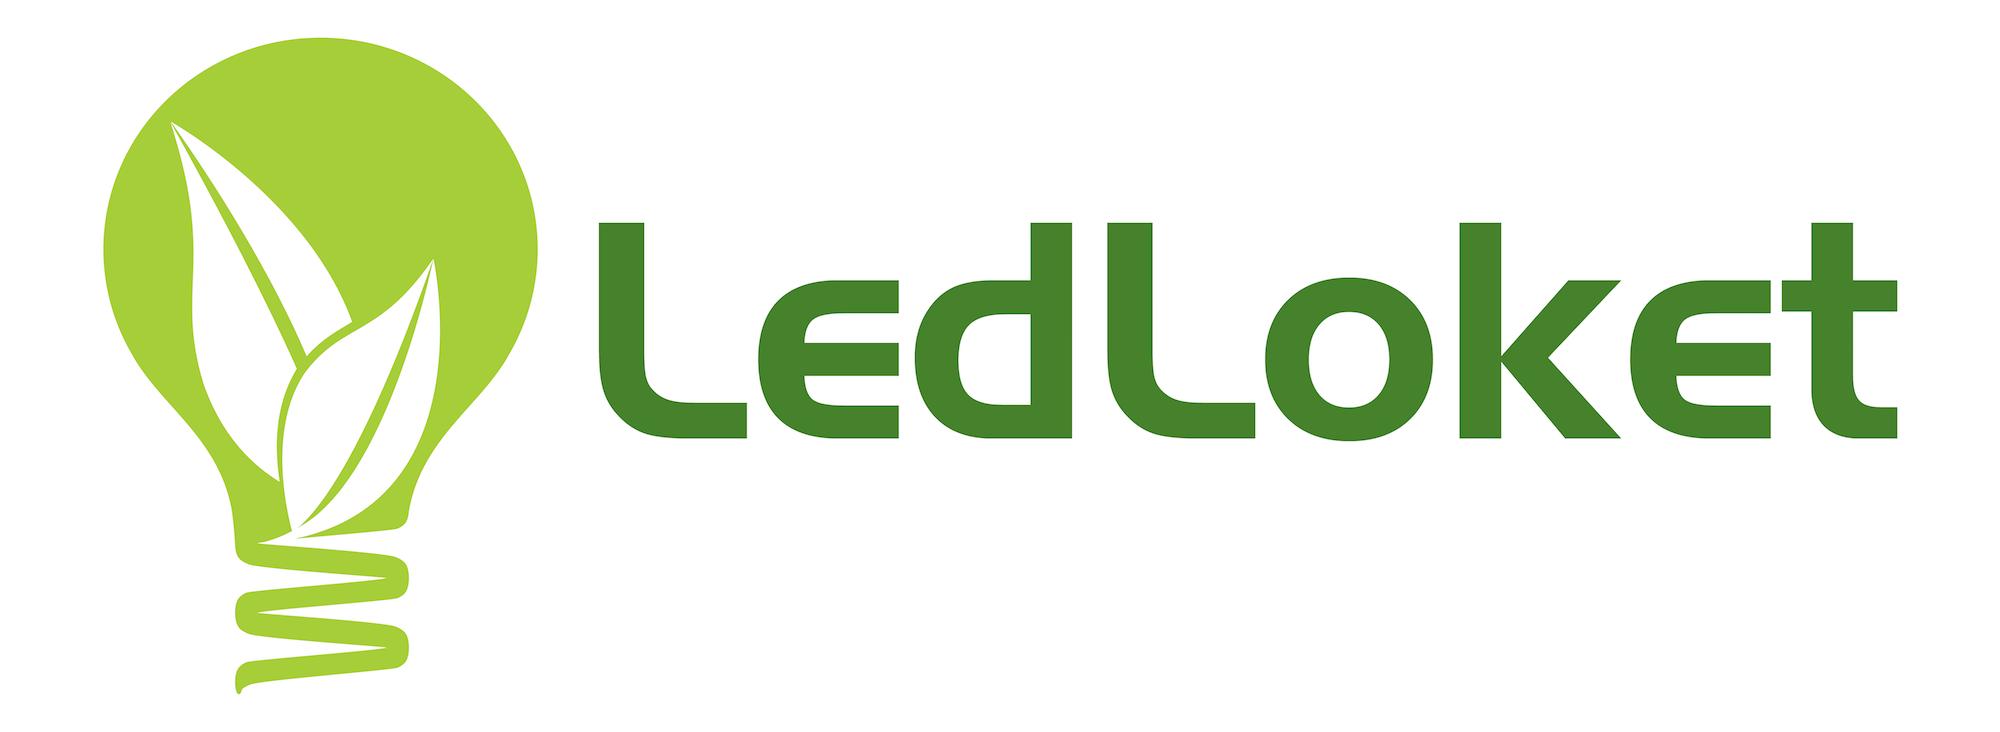 LedLoket